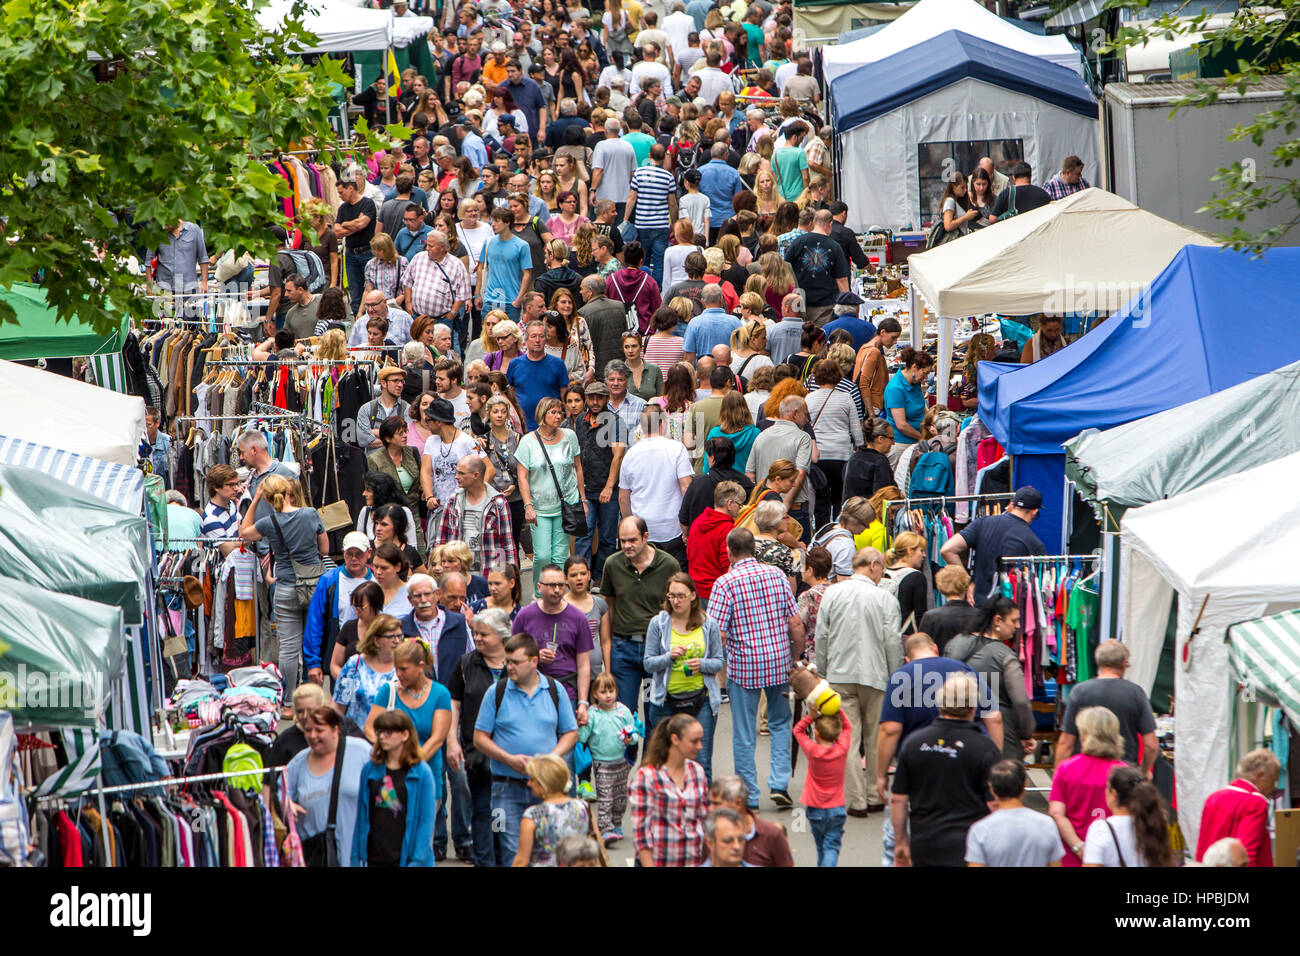 Large flea market, flea market in the summer festival on the Gruga Park, in Essen, Germany, Stock Photo